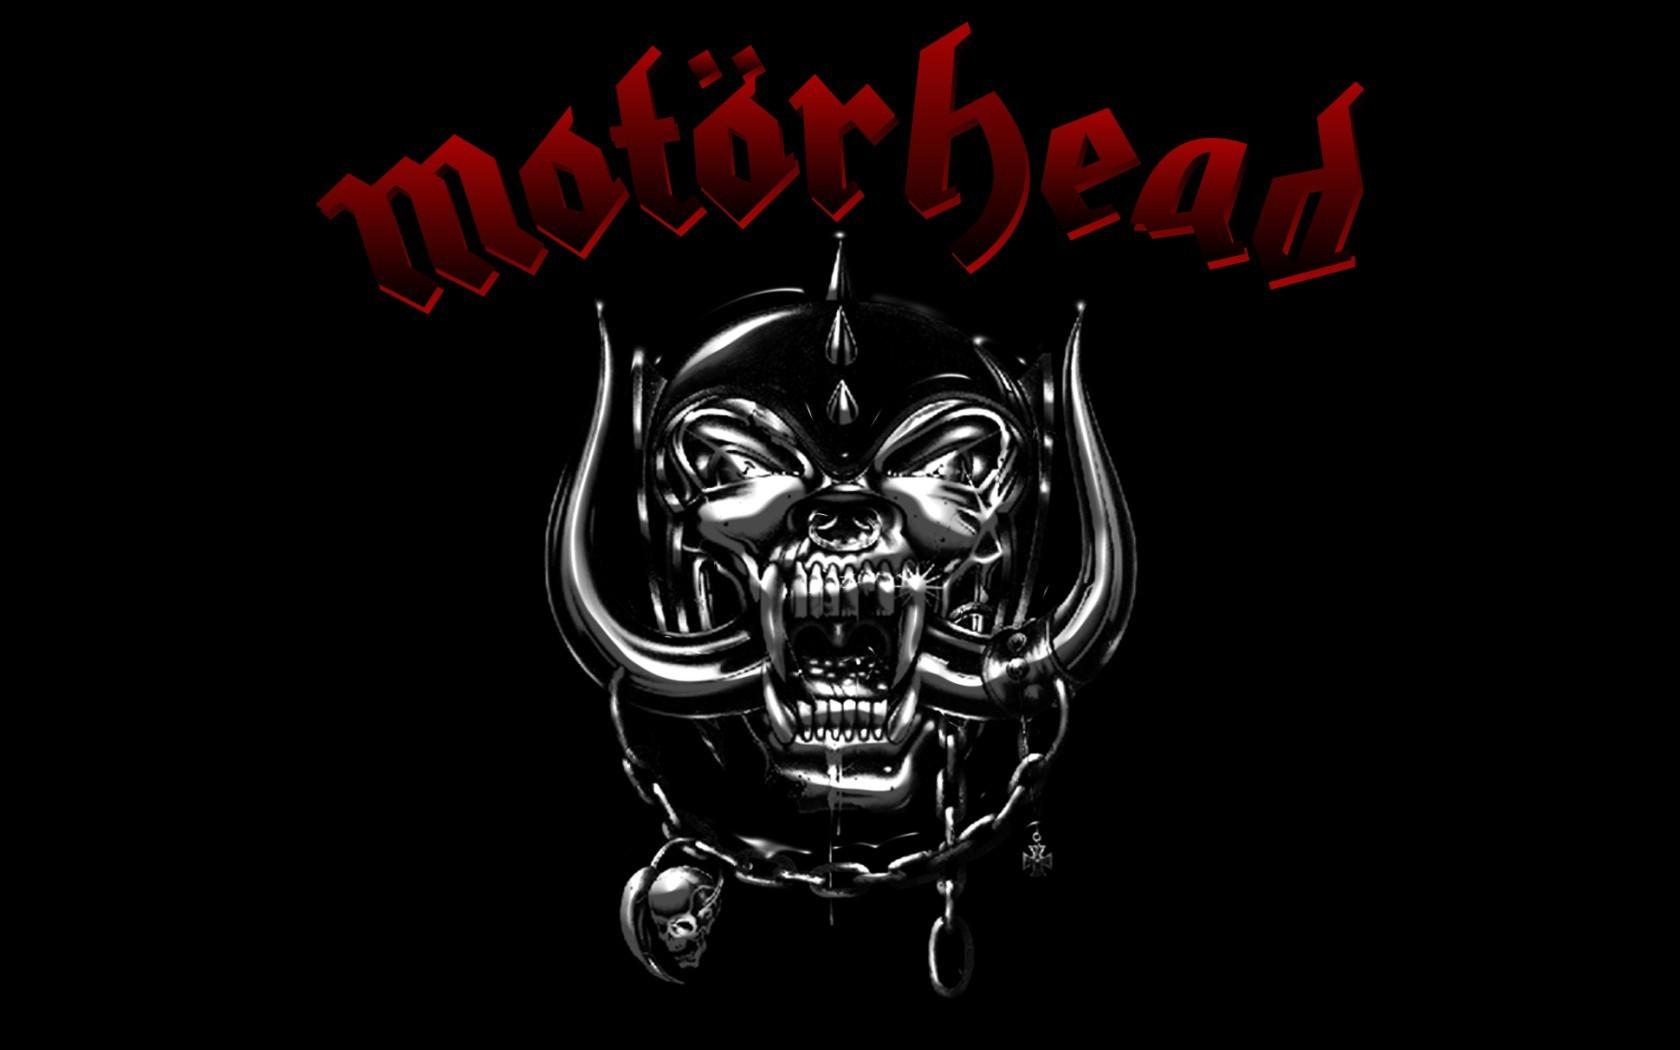 motorhead_music_bands_wallpaper-2849